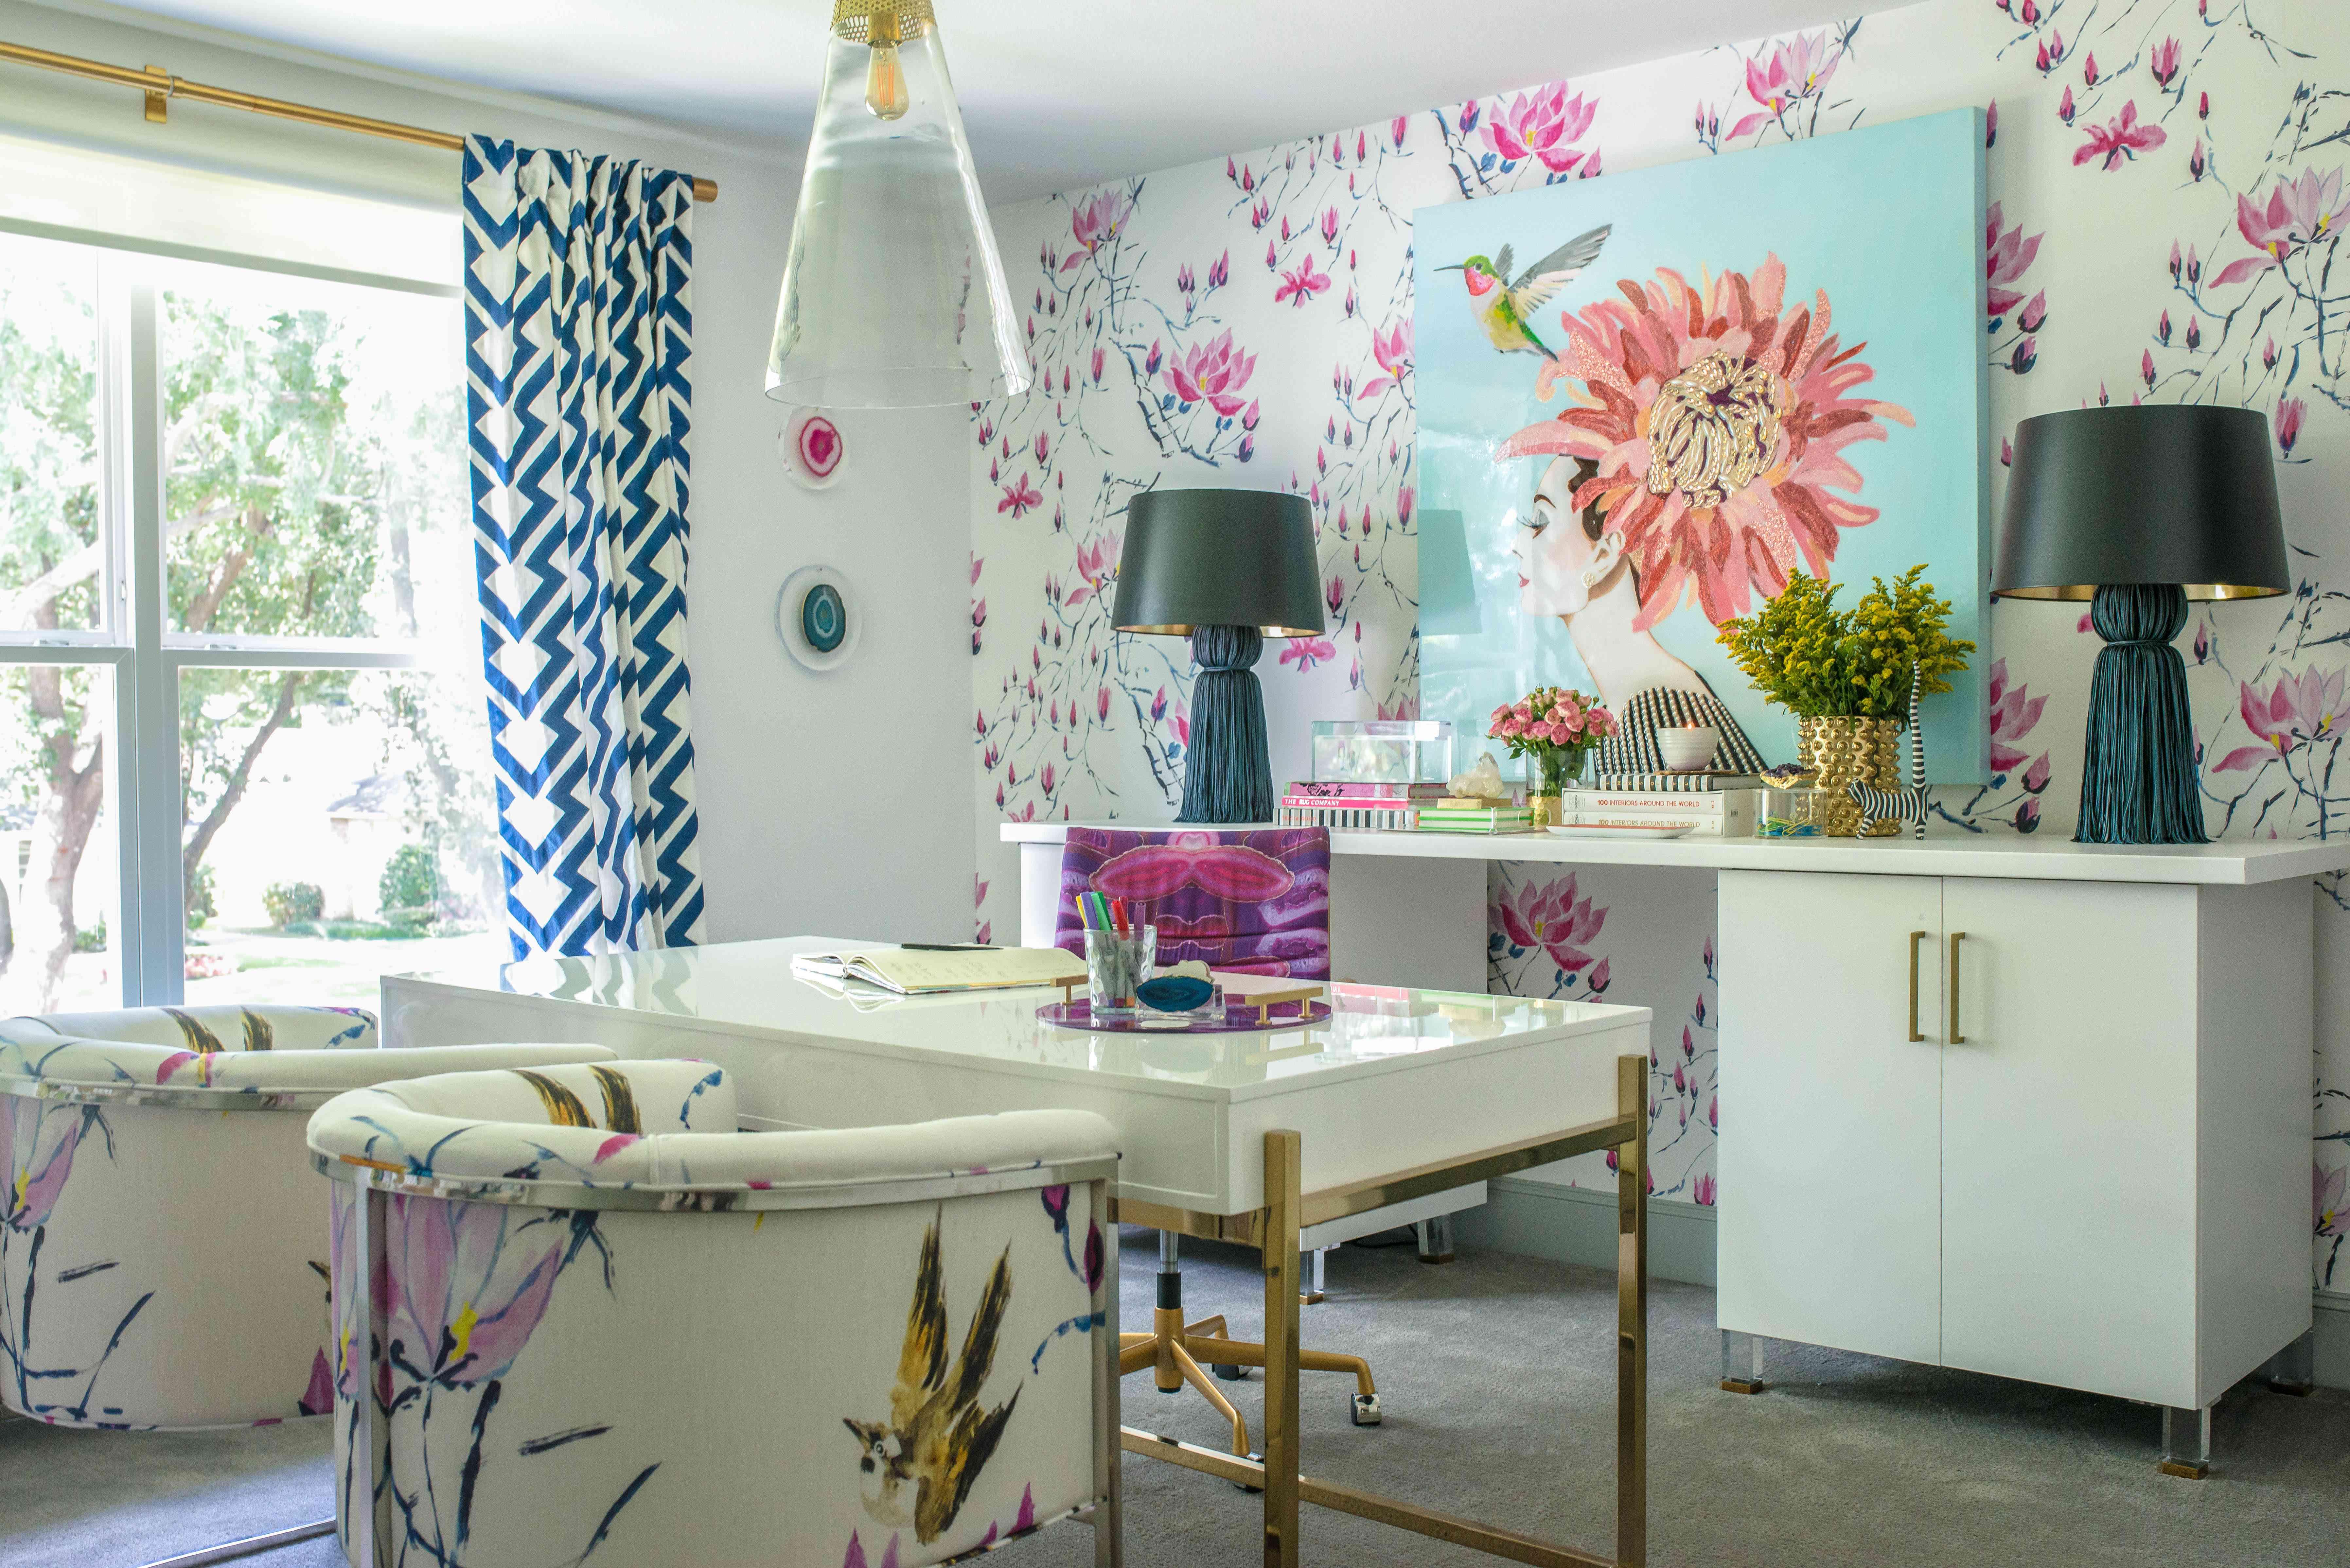 IKEA Products Interior Designers Love